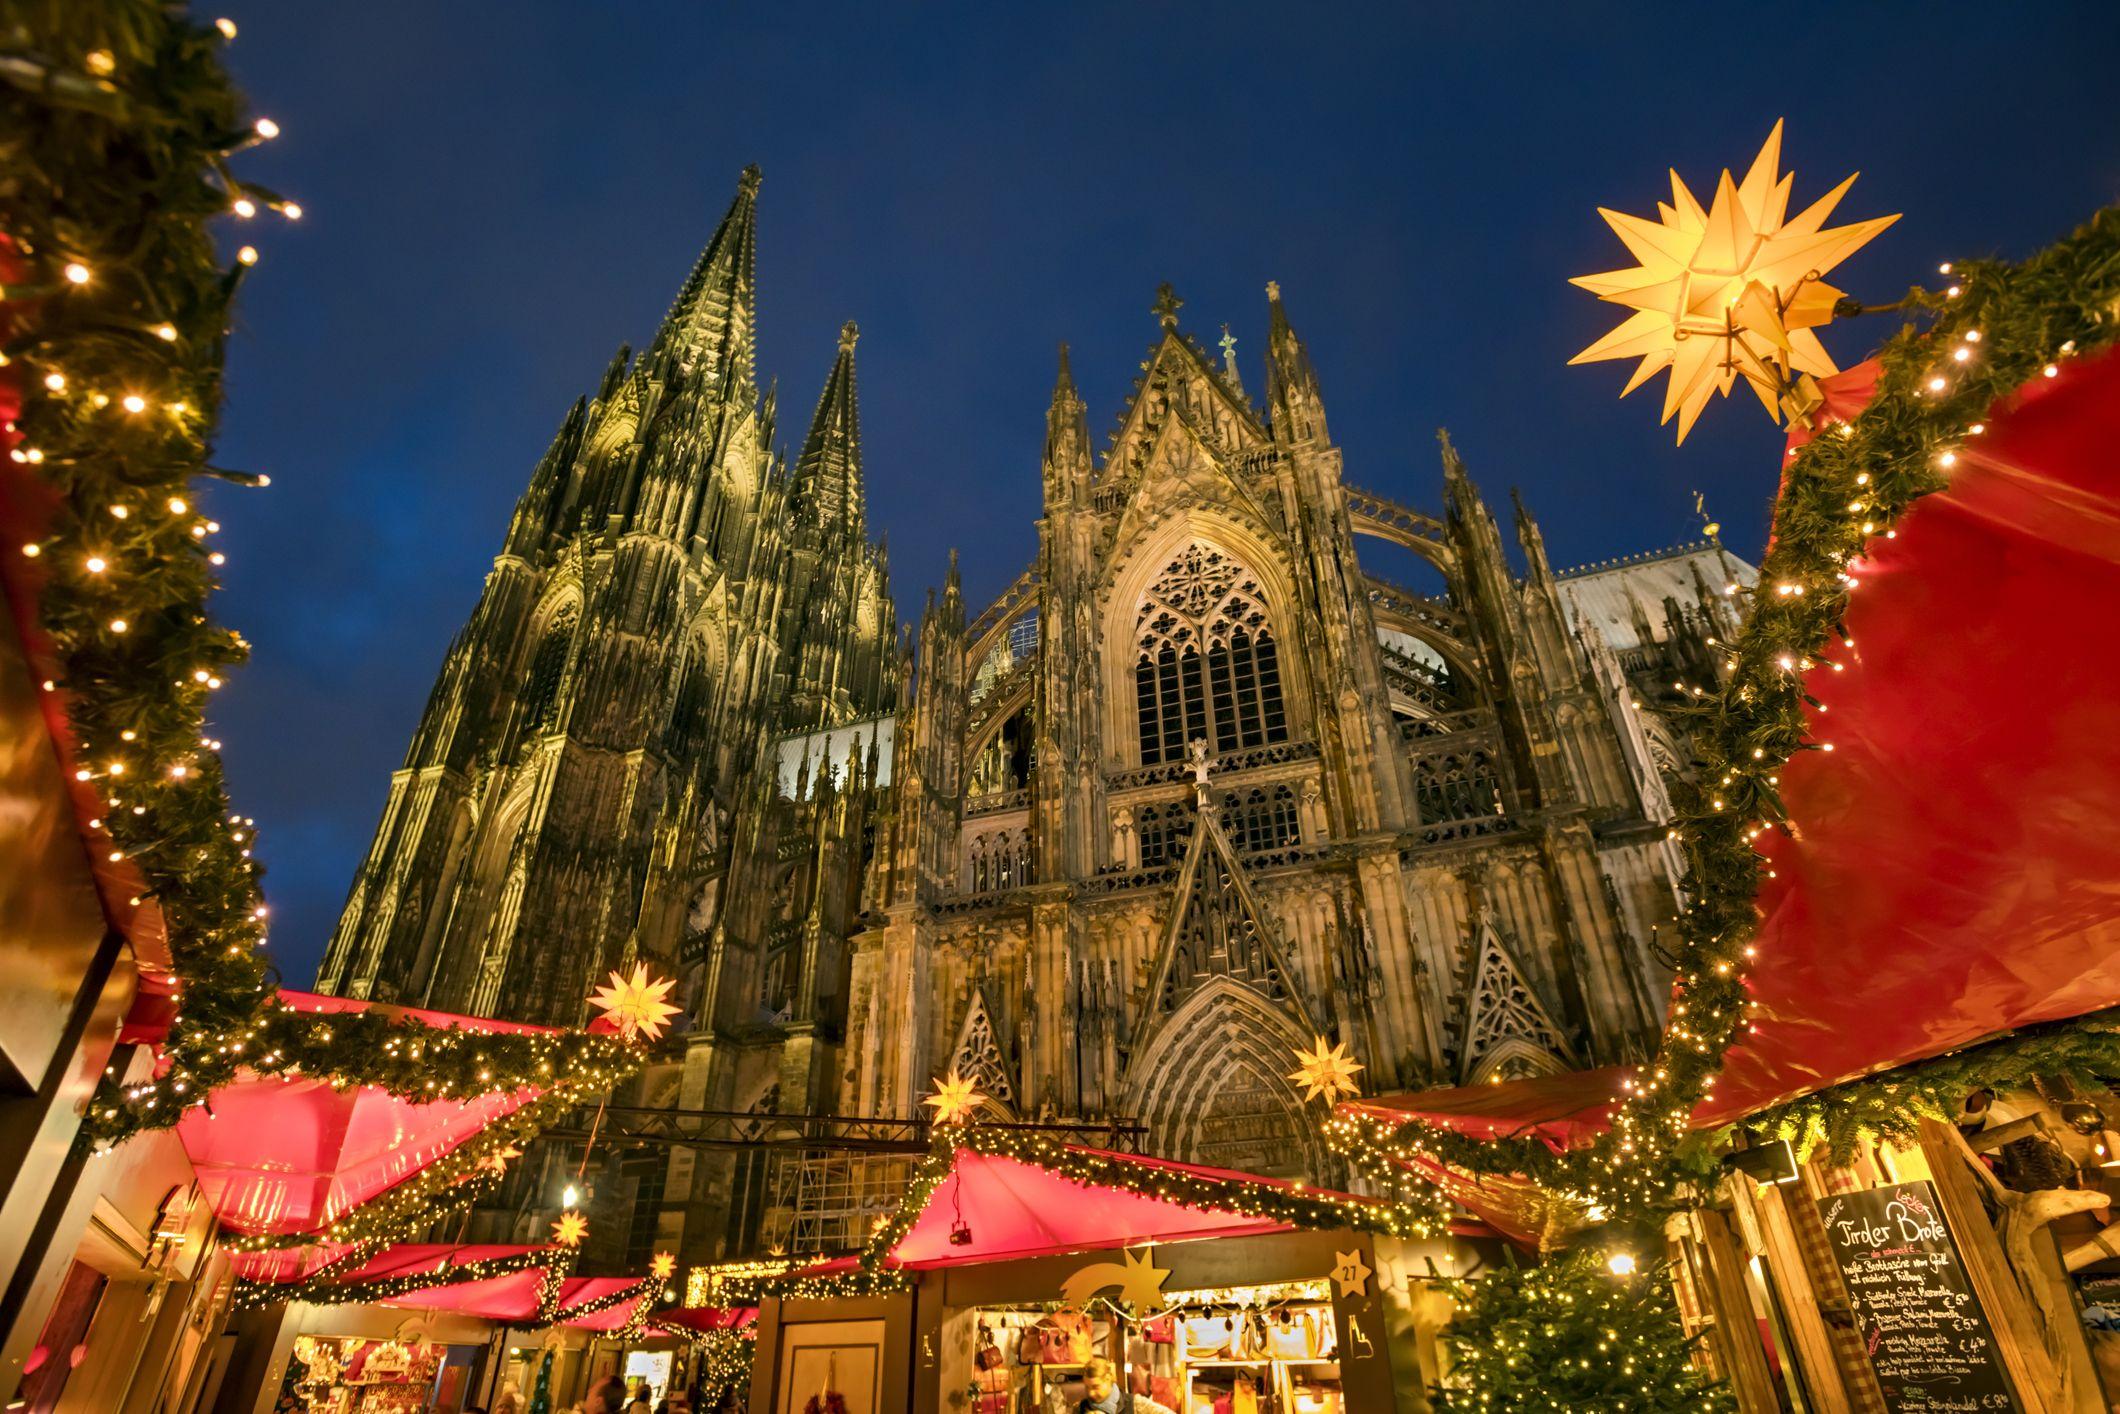 Cologne Christmas Market 2021 Cologne Christmas Market Best Christmas Market Breaks